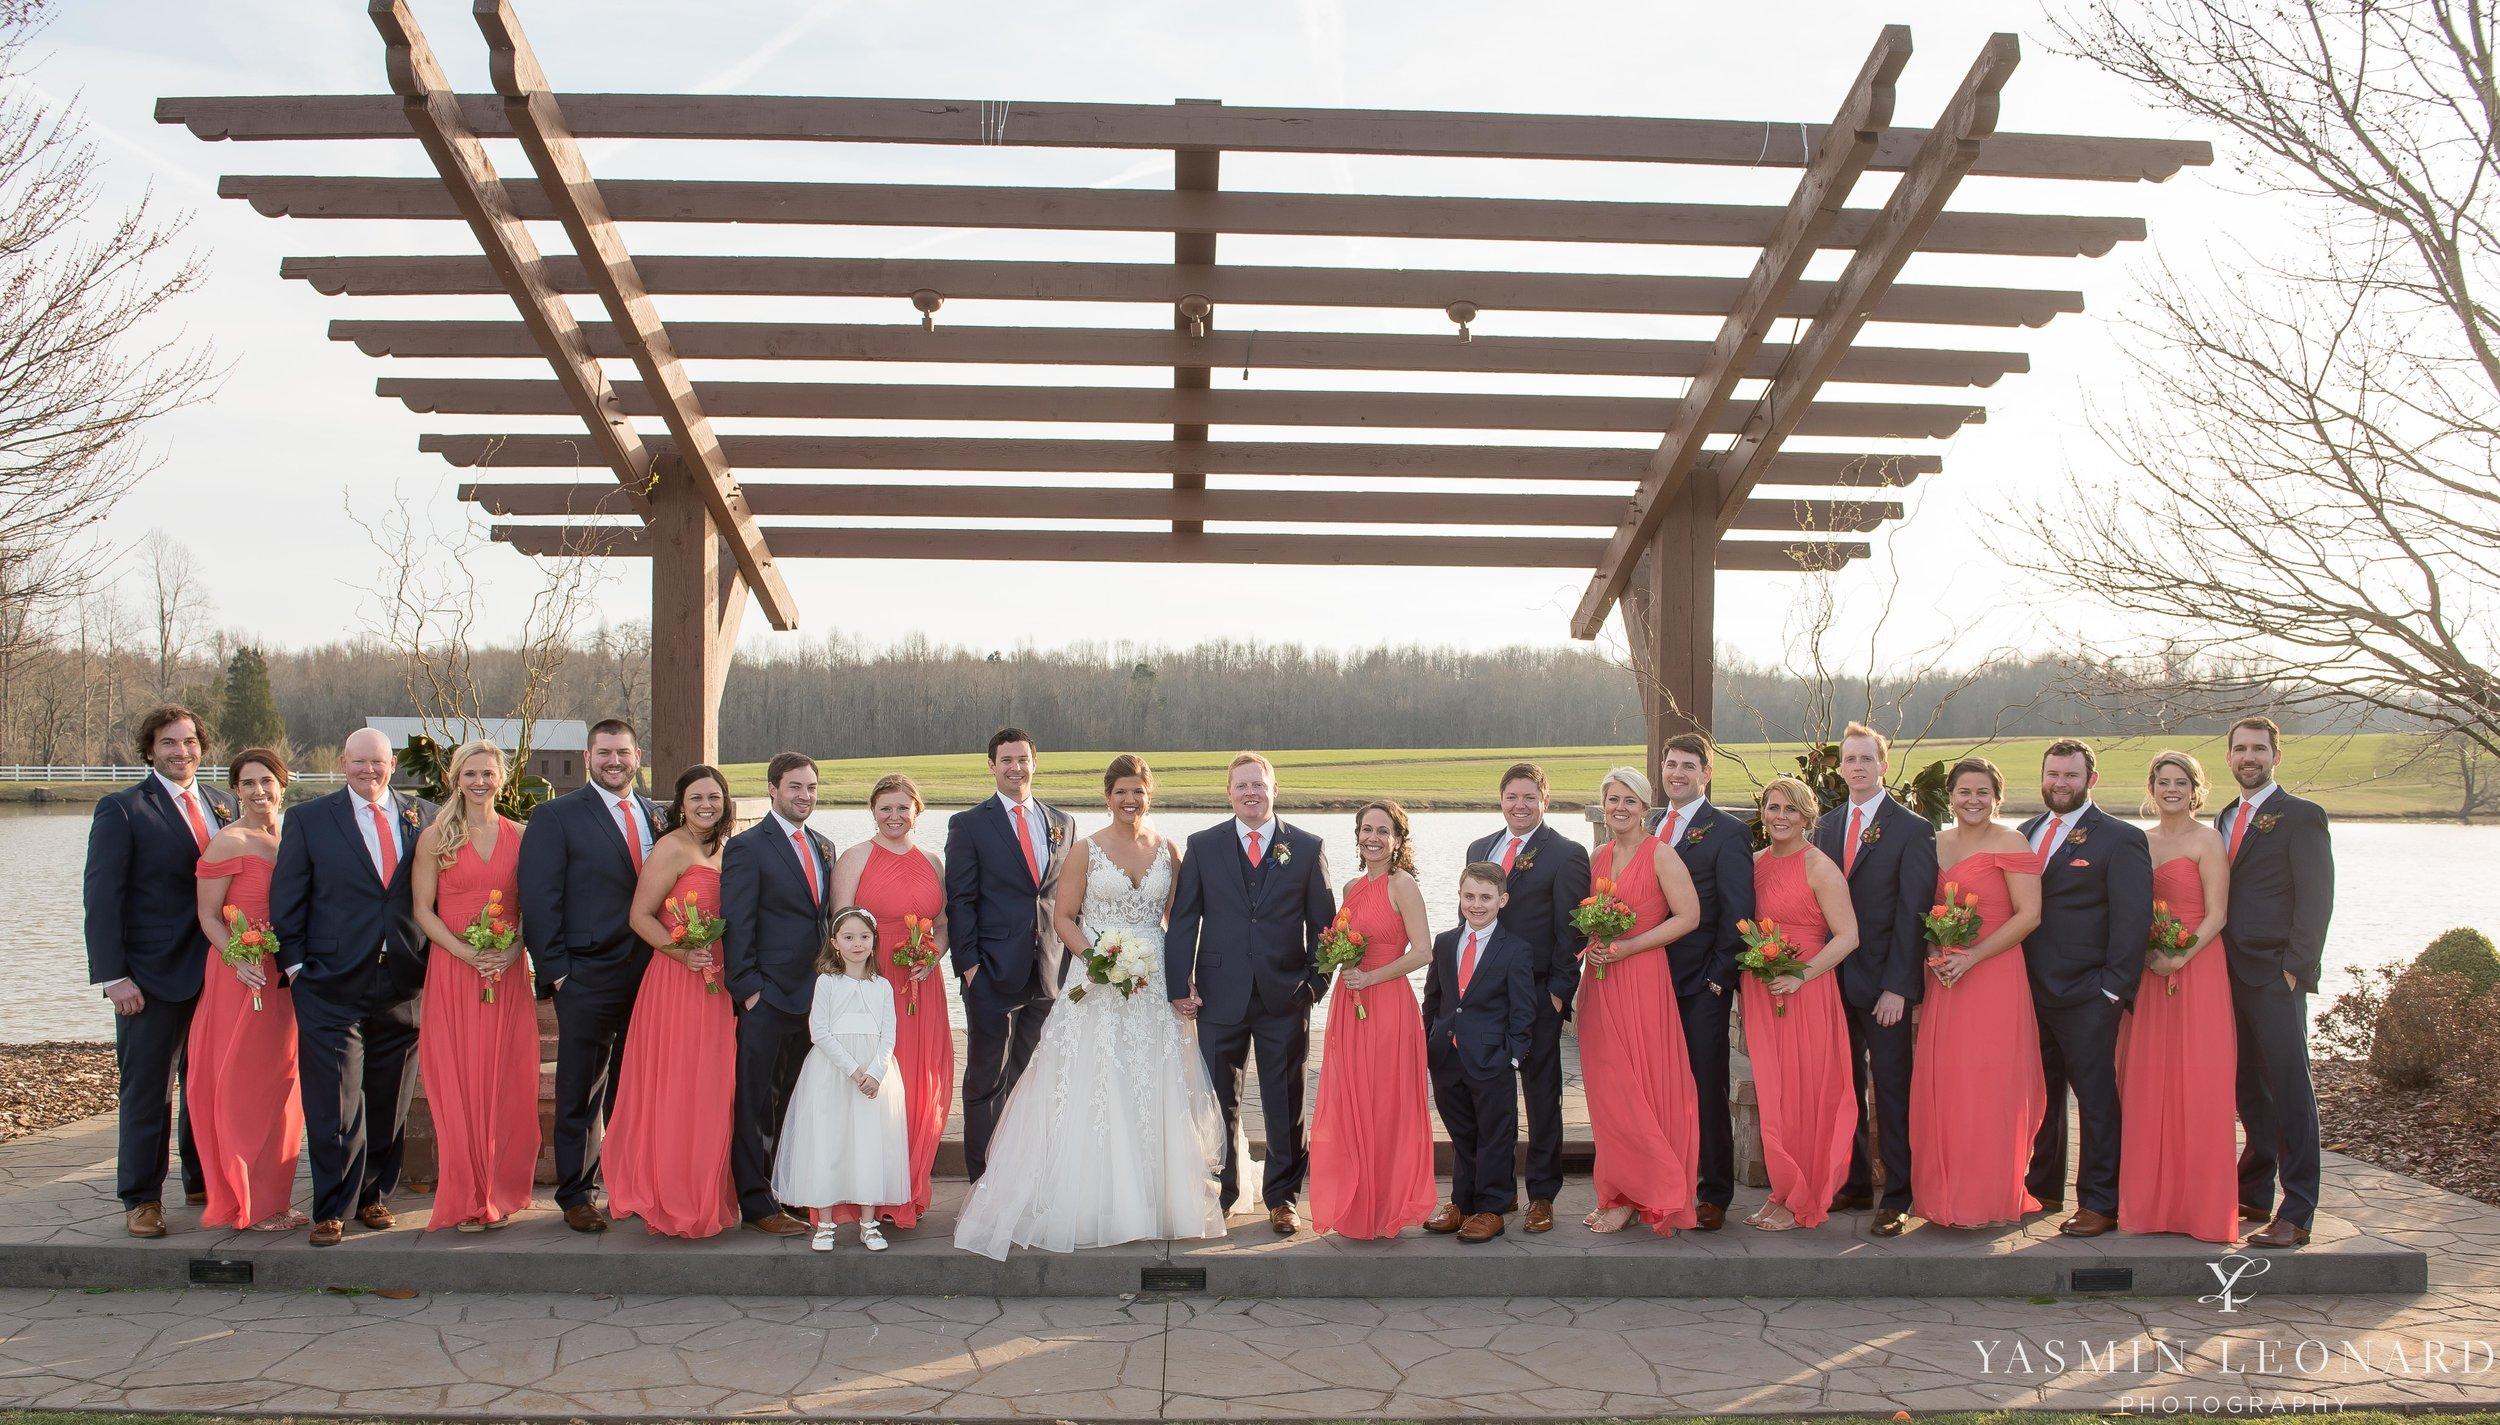 Adaumont Farm - Adaumont Farm Weddings - Trinity Weddings - NC Weddings - Yasmin Leonard Photography-40.jpg